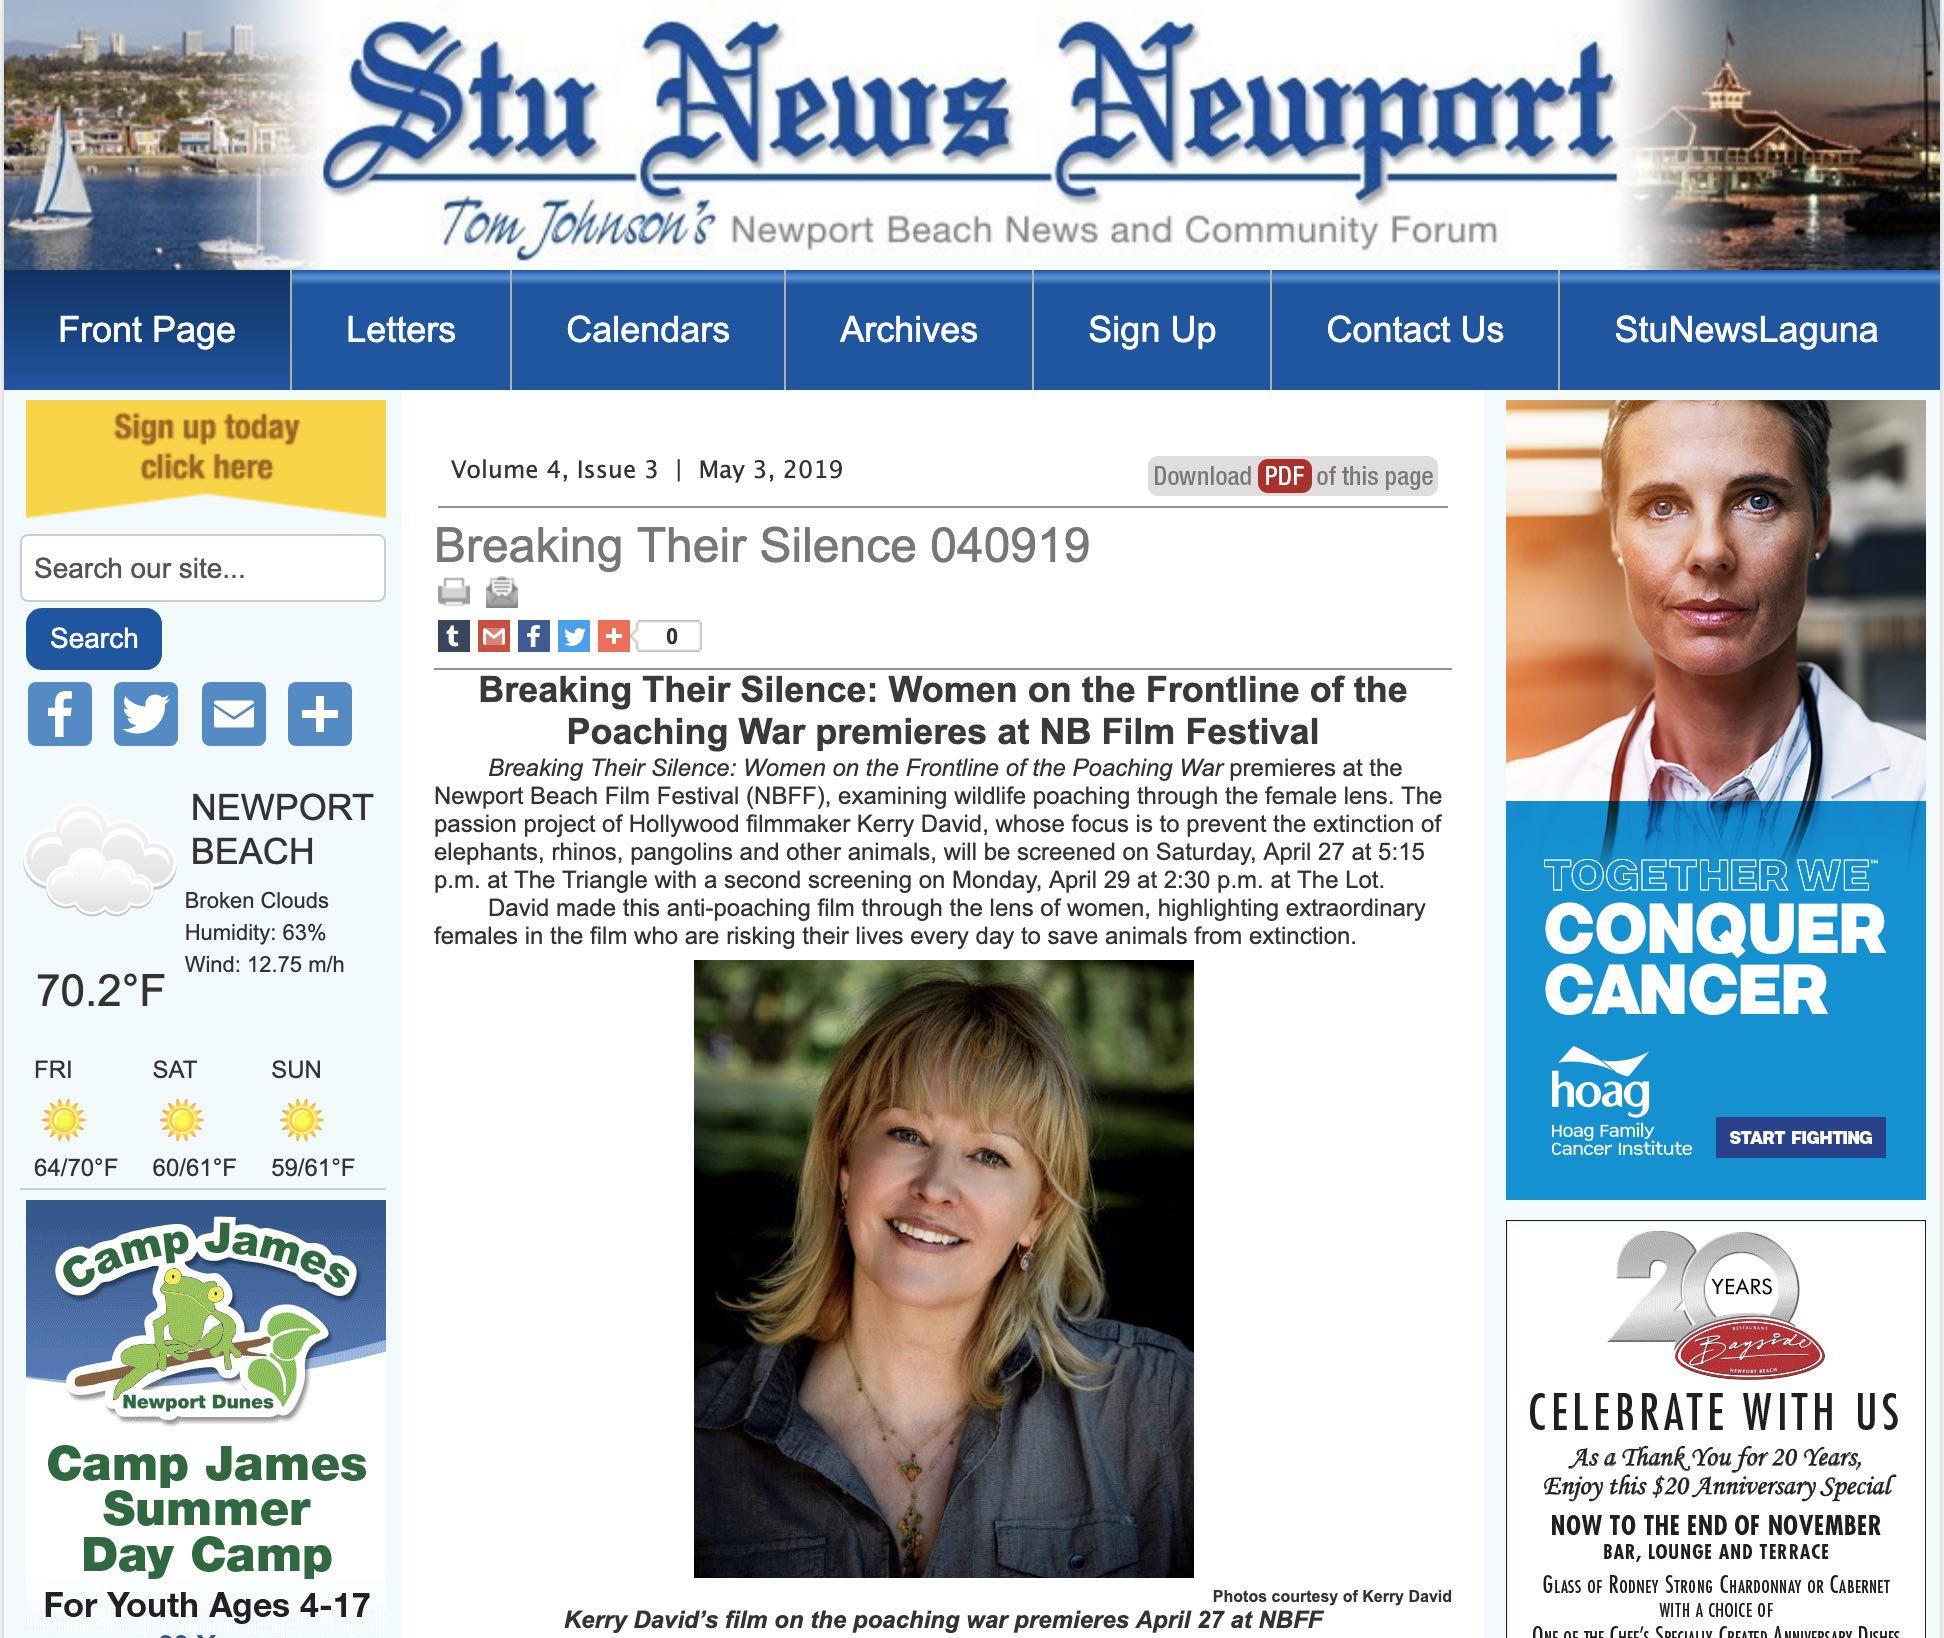 Stu News Report.jpg